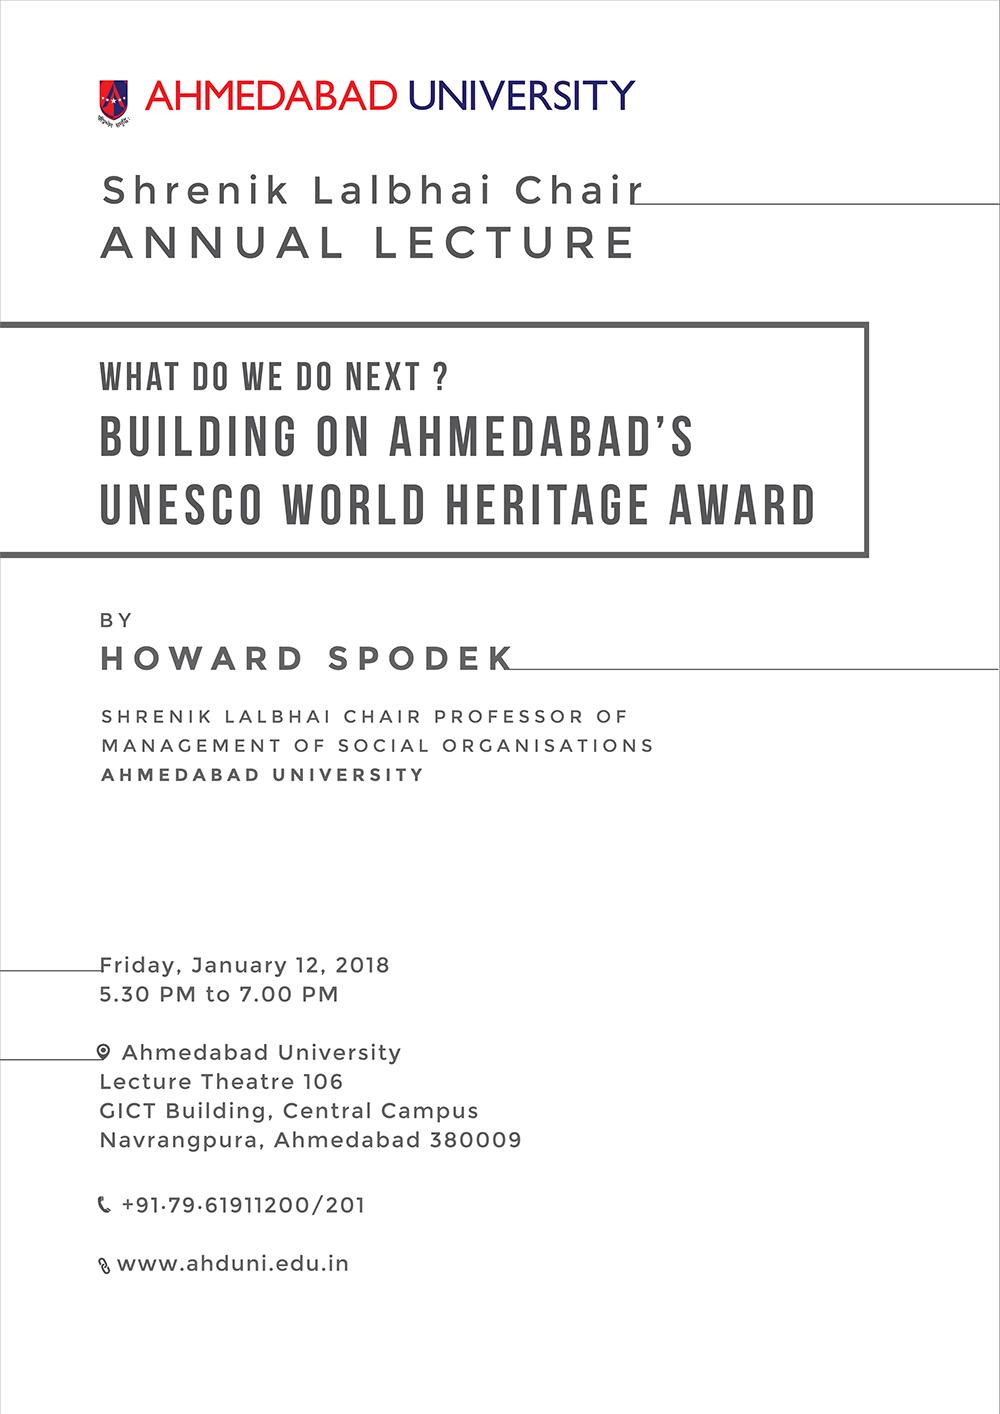 https://creativeyatra.com/wp-content/uploads/2018/01/Ahmedabad-University.jpg